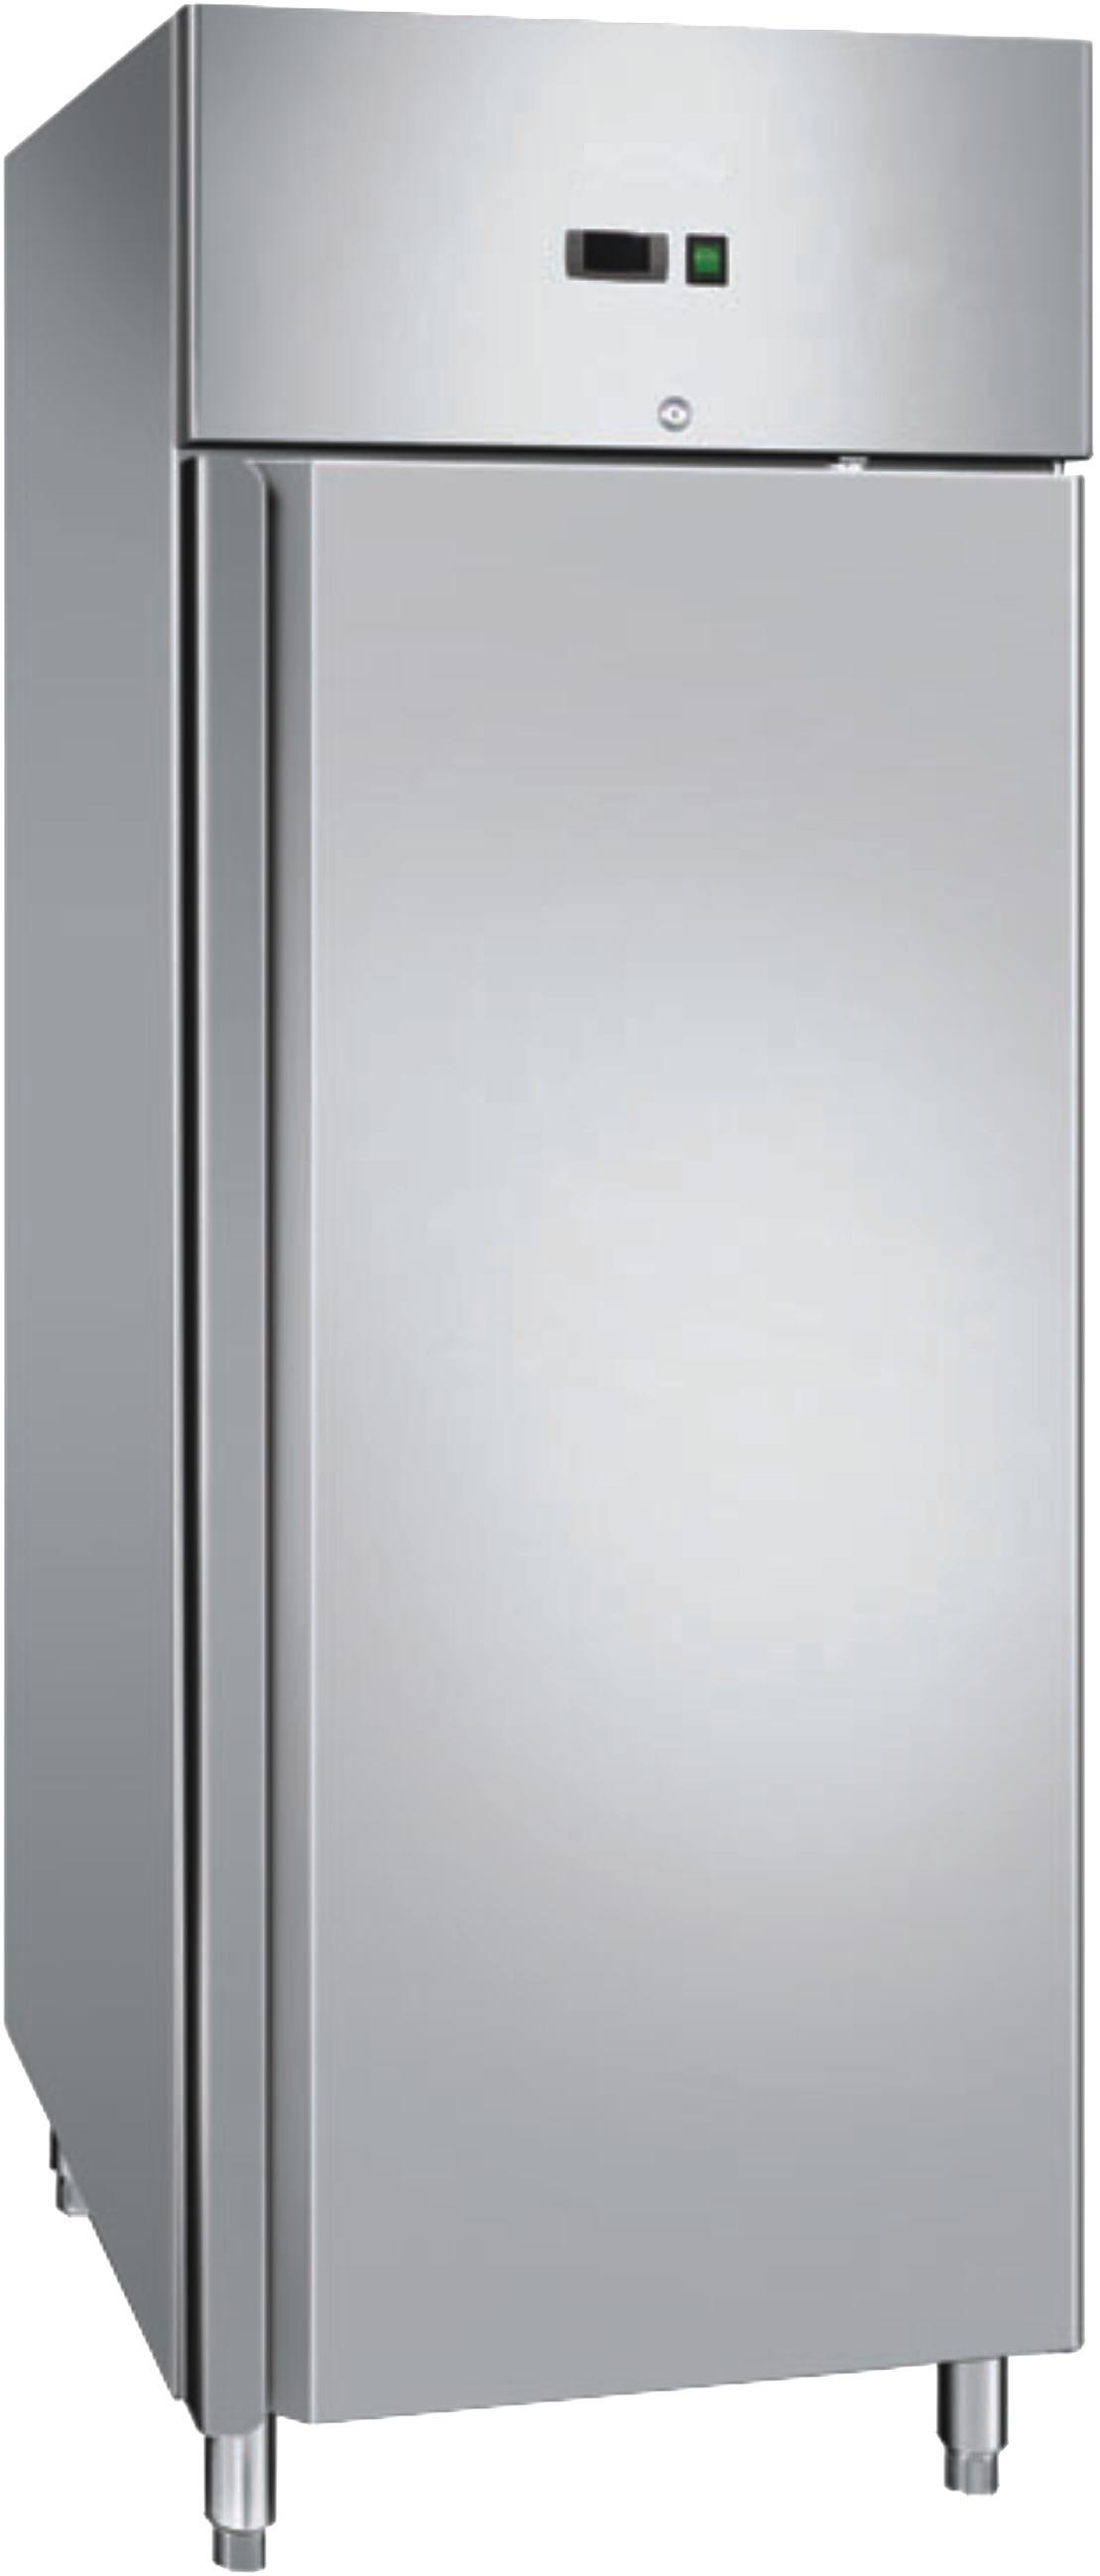 armoire frigorifique ar 650 sn. Black Bedroom Furniture Sets. Home Design Ideas